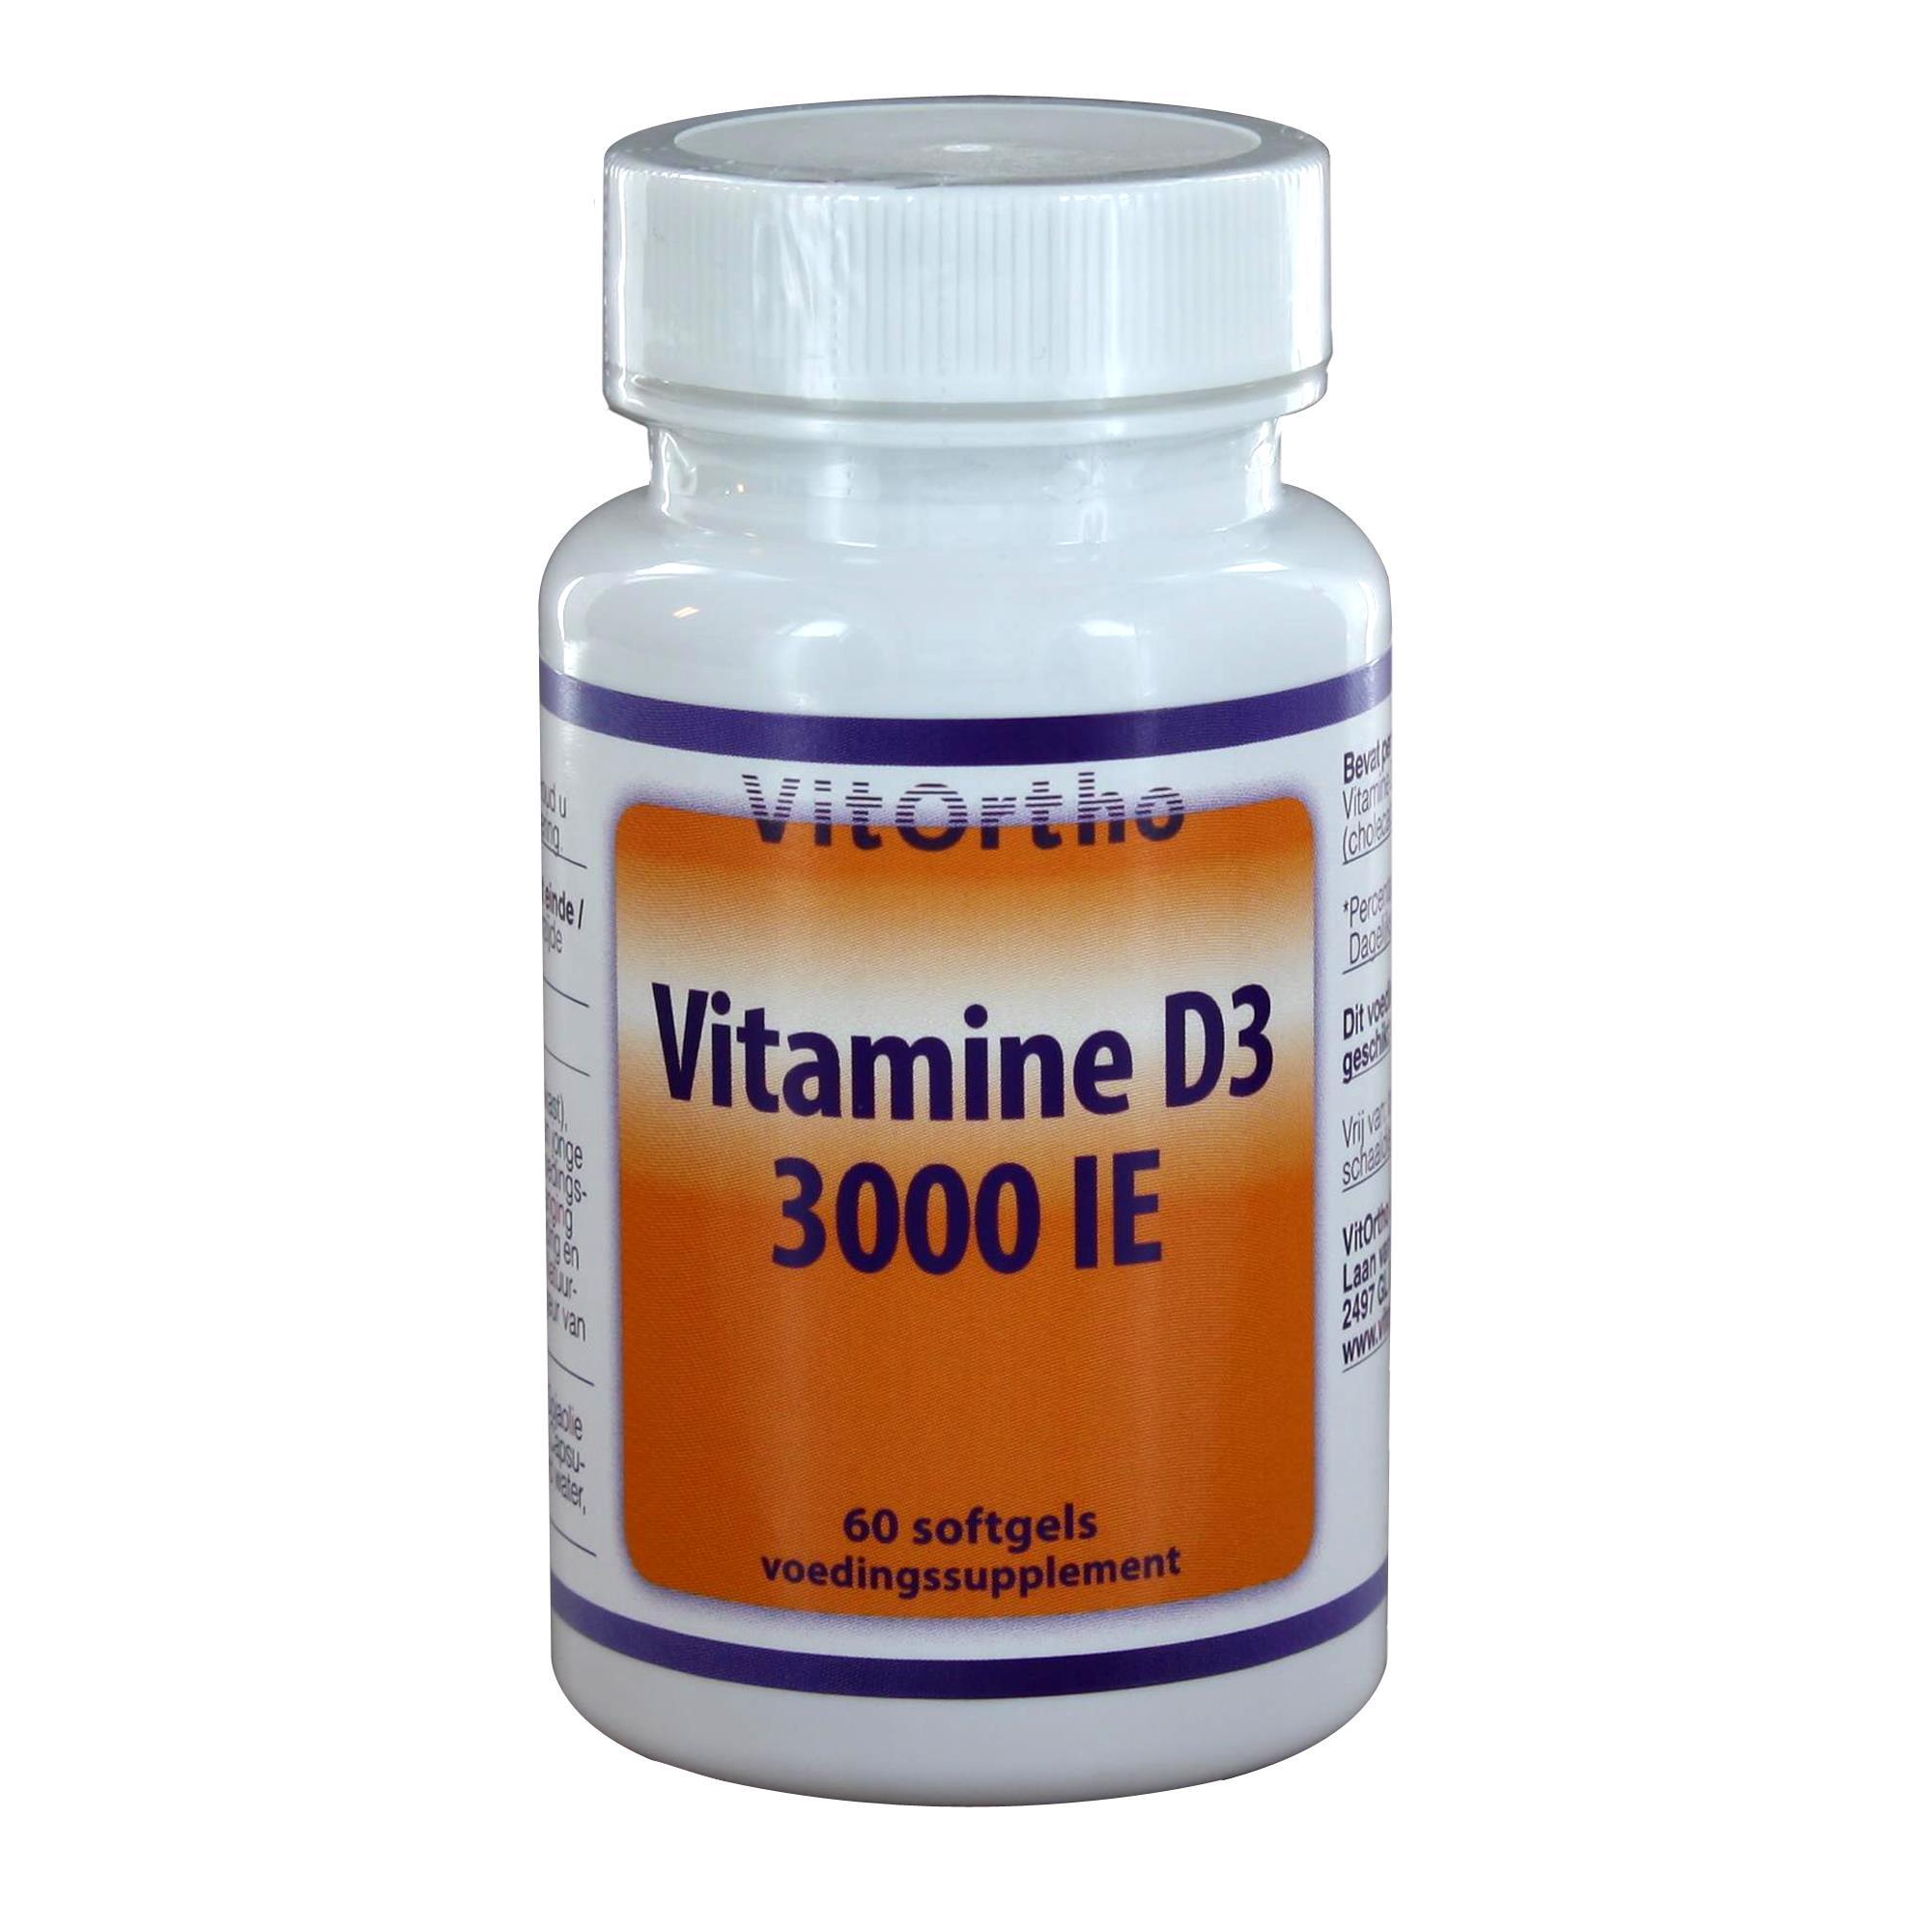 img 2408 - Vitamine D3 3000 IE (60 softgels) - VitOrtho